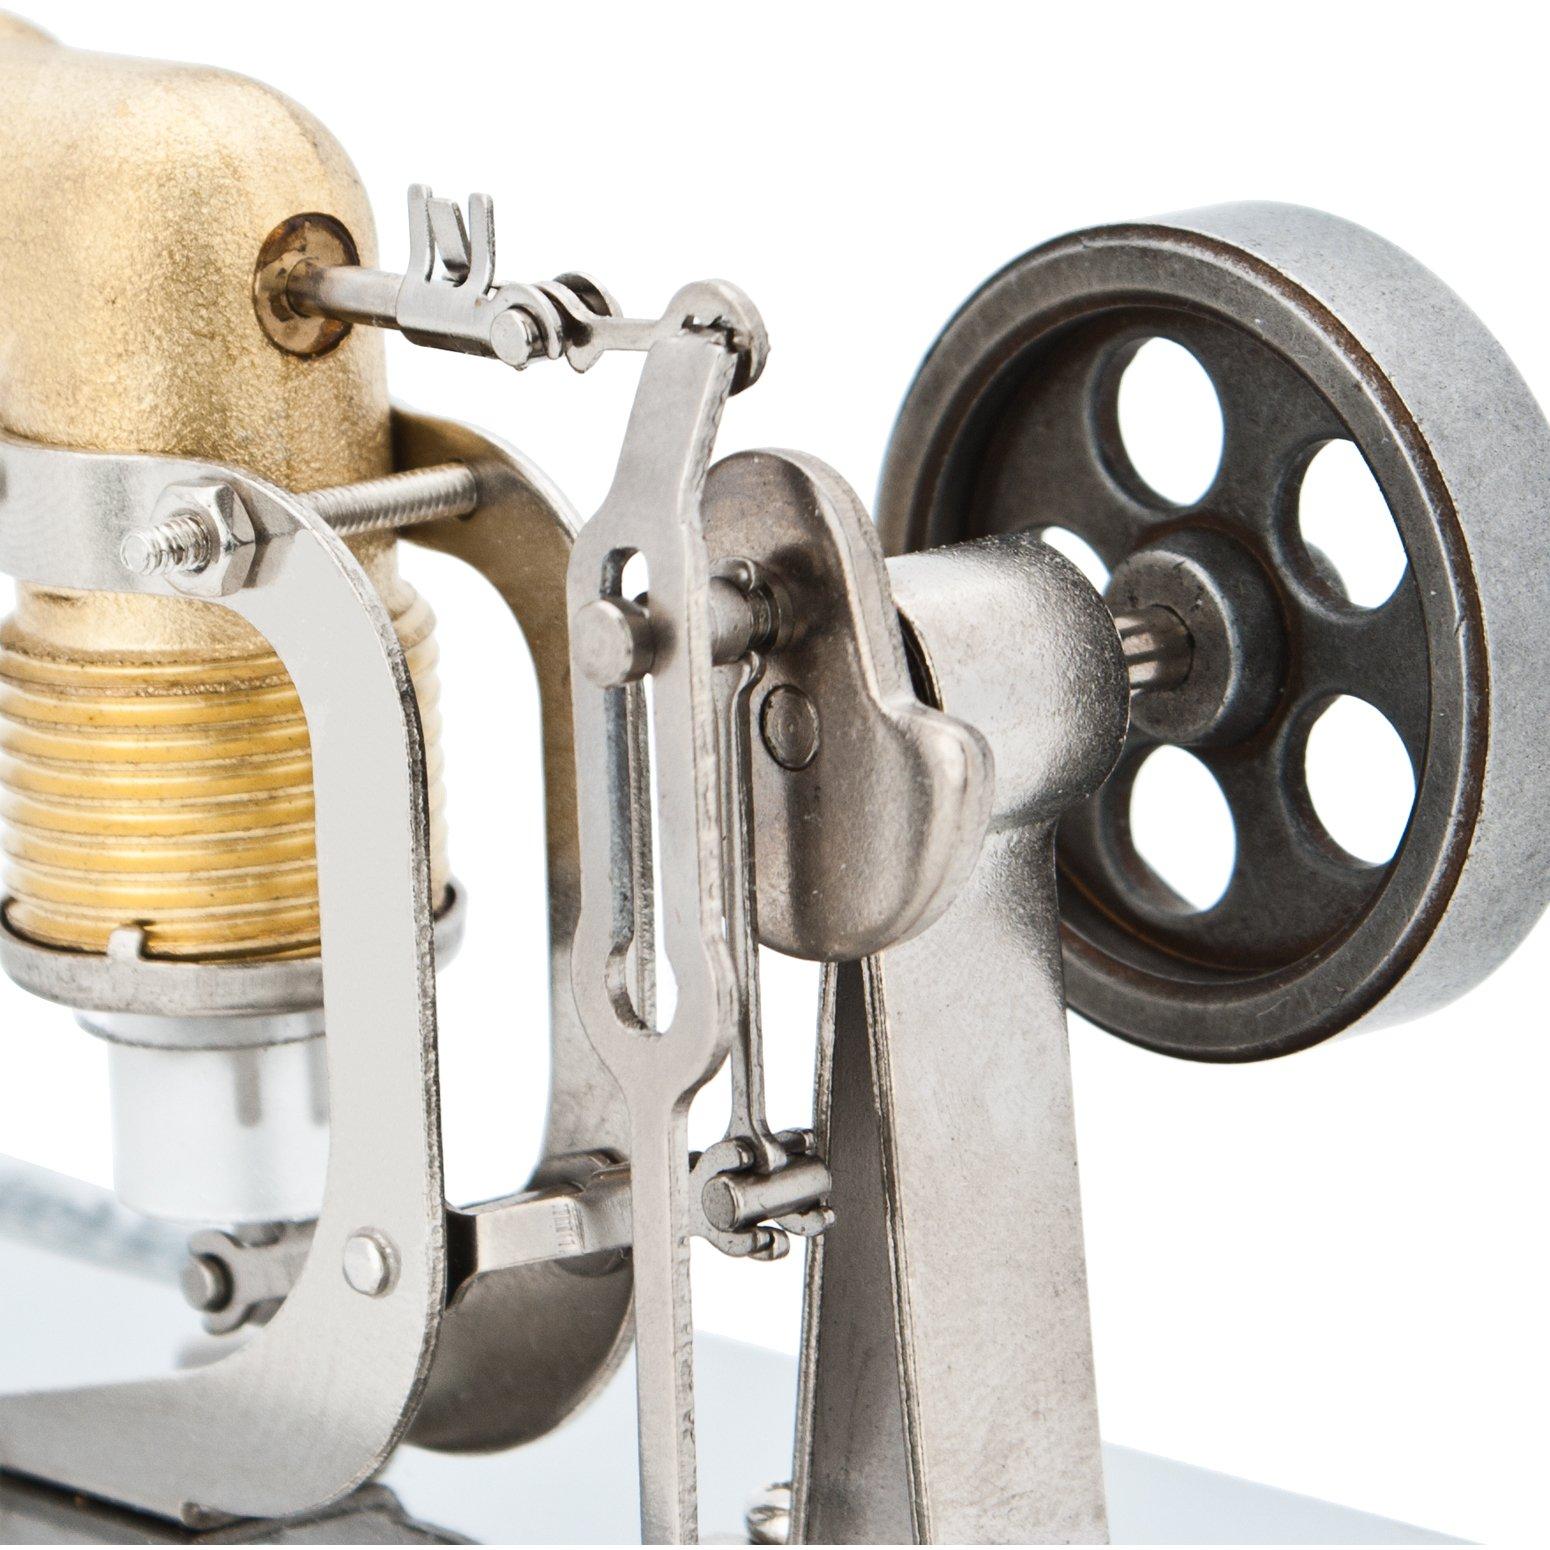 DjuiinoStar Mini Hot Air Stirling Engine: A High Performance Pocket-Sized Working Model by DjuiinoStar (Image #6)